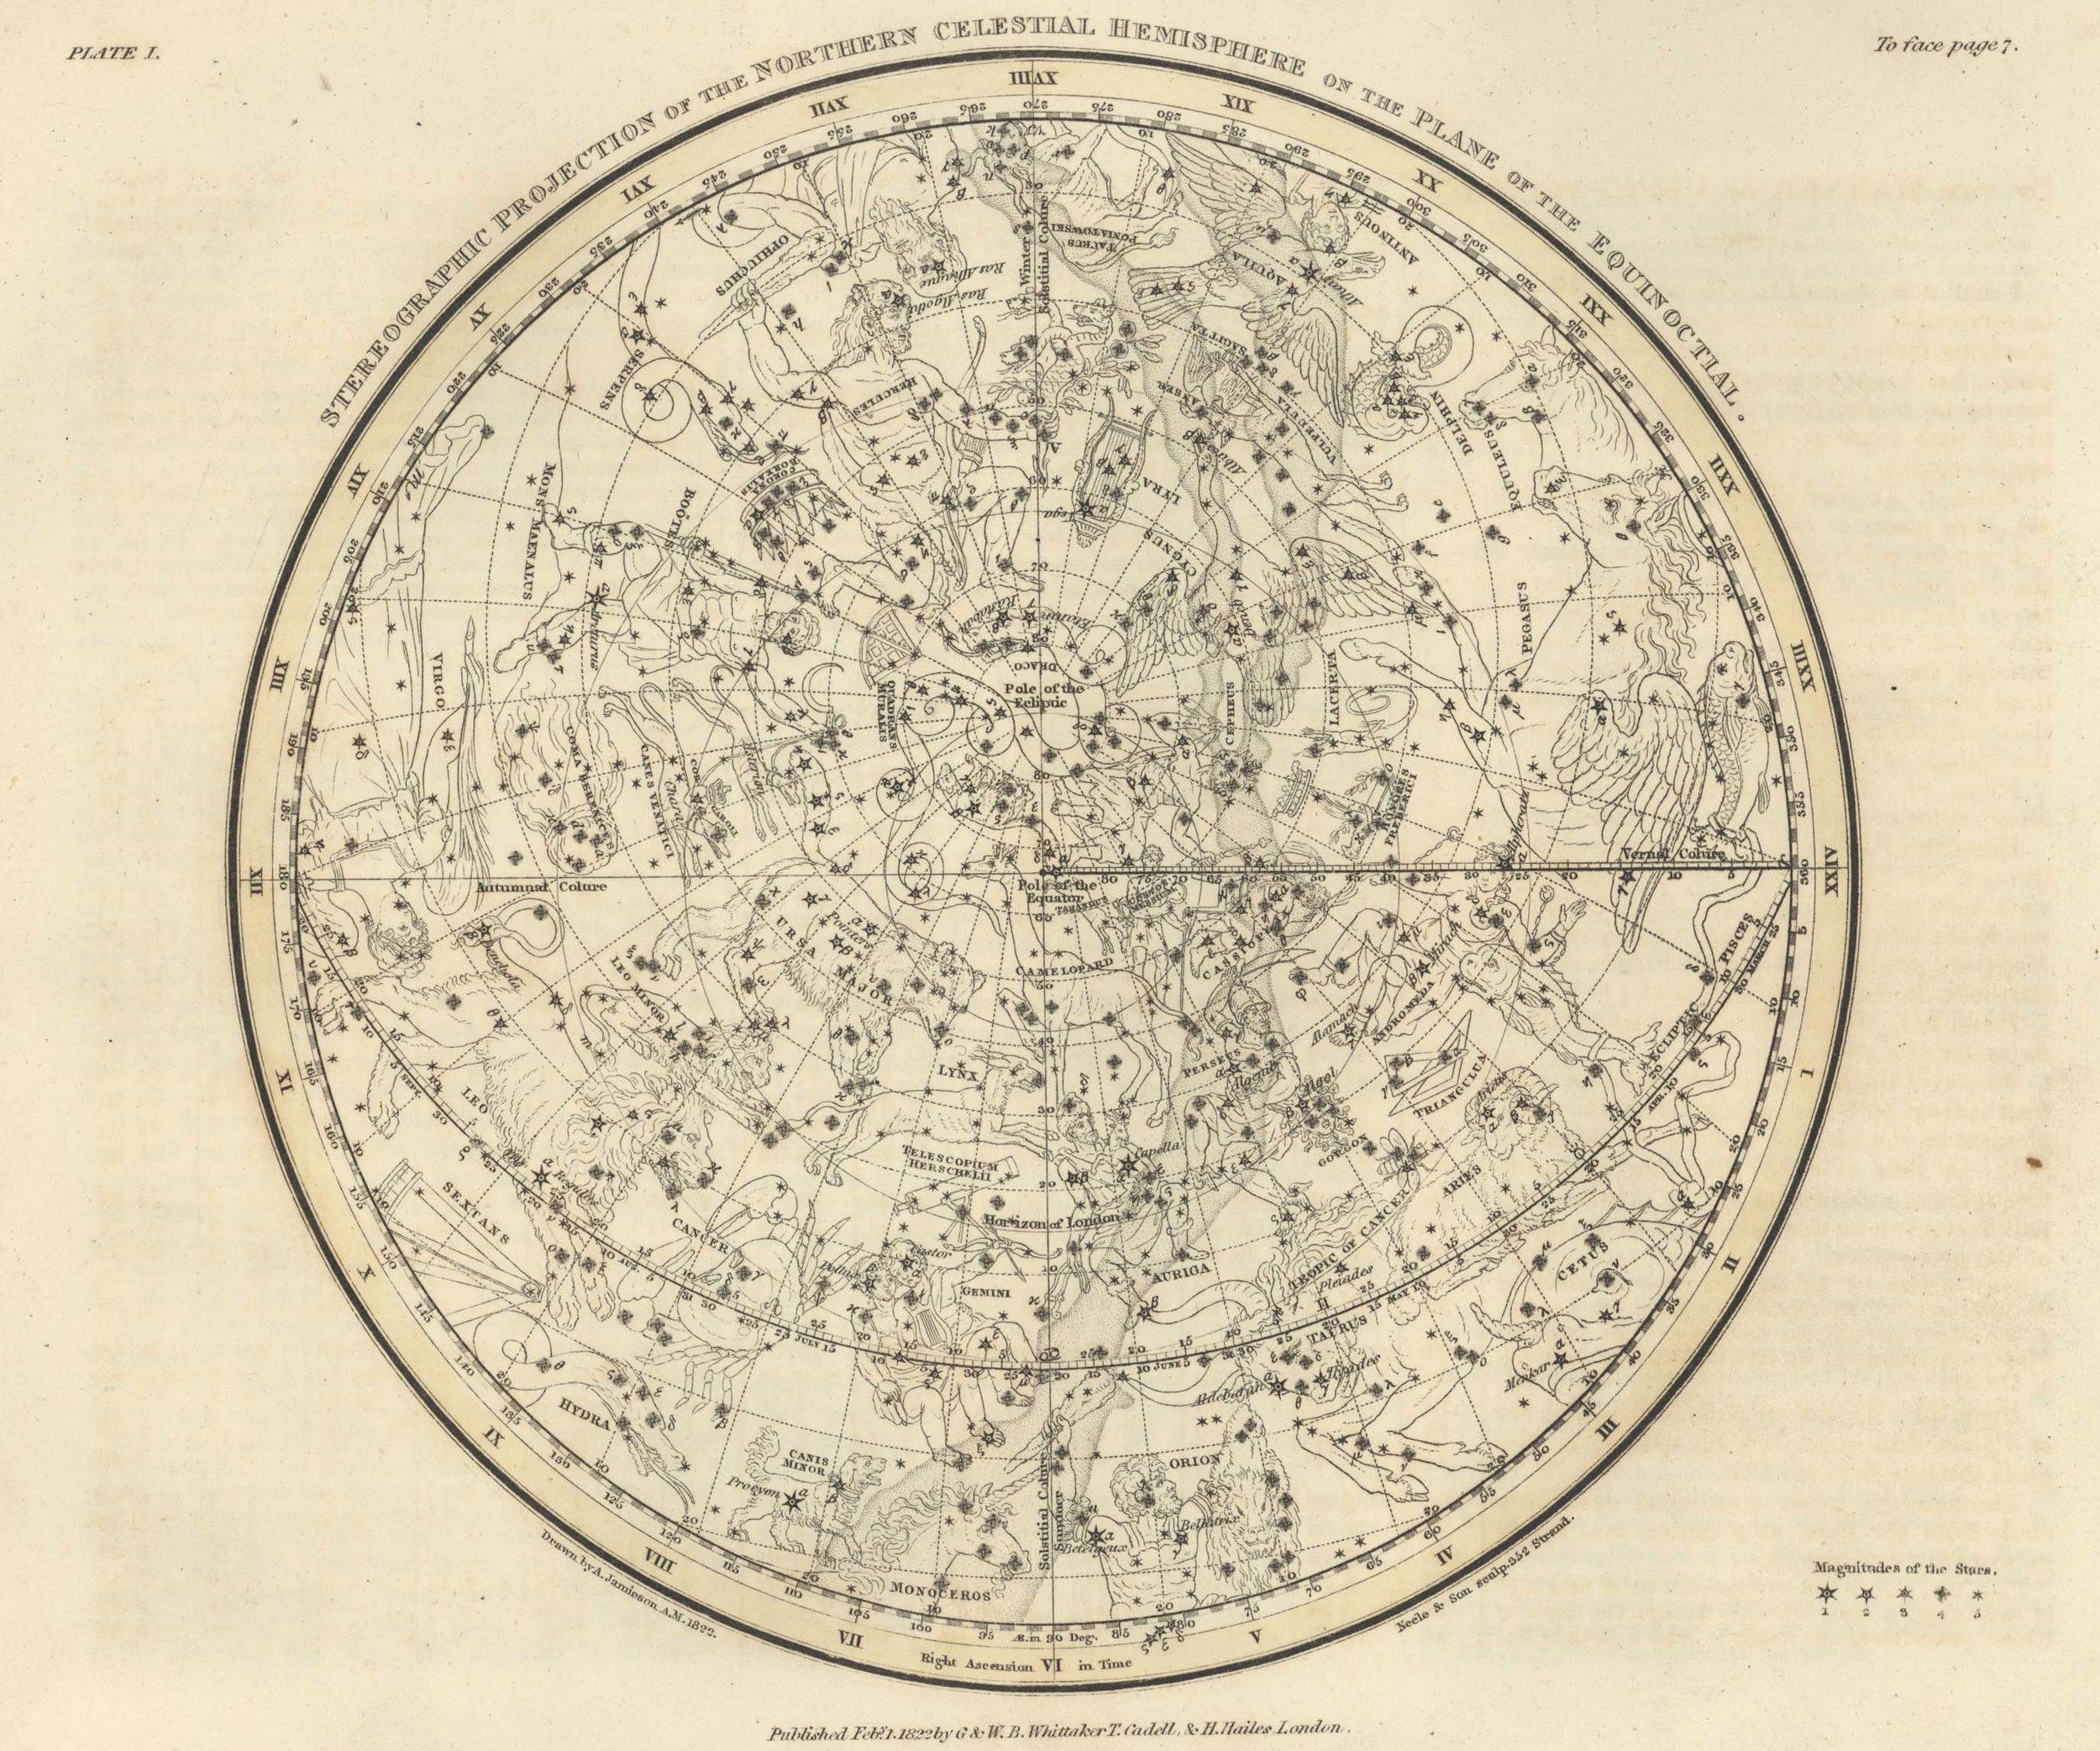 Celestial Atlas, Plate 1: Northern Hemisphere, by Alexander Jamieson